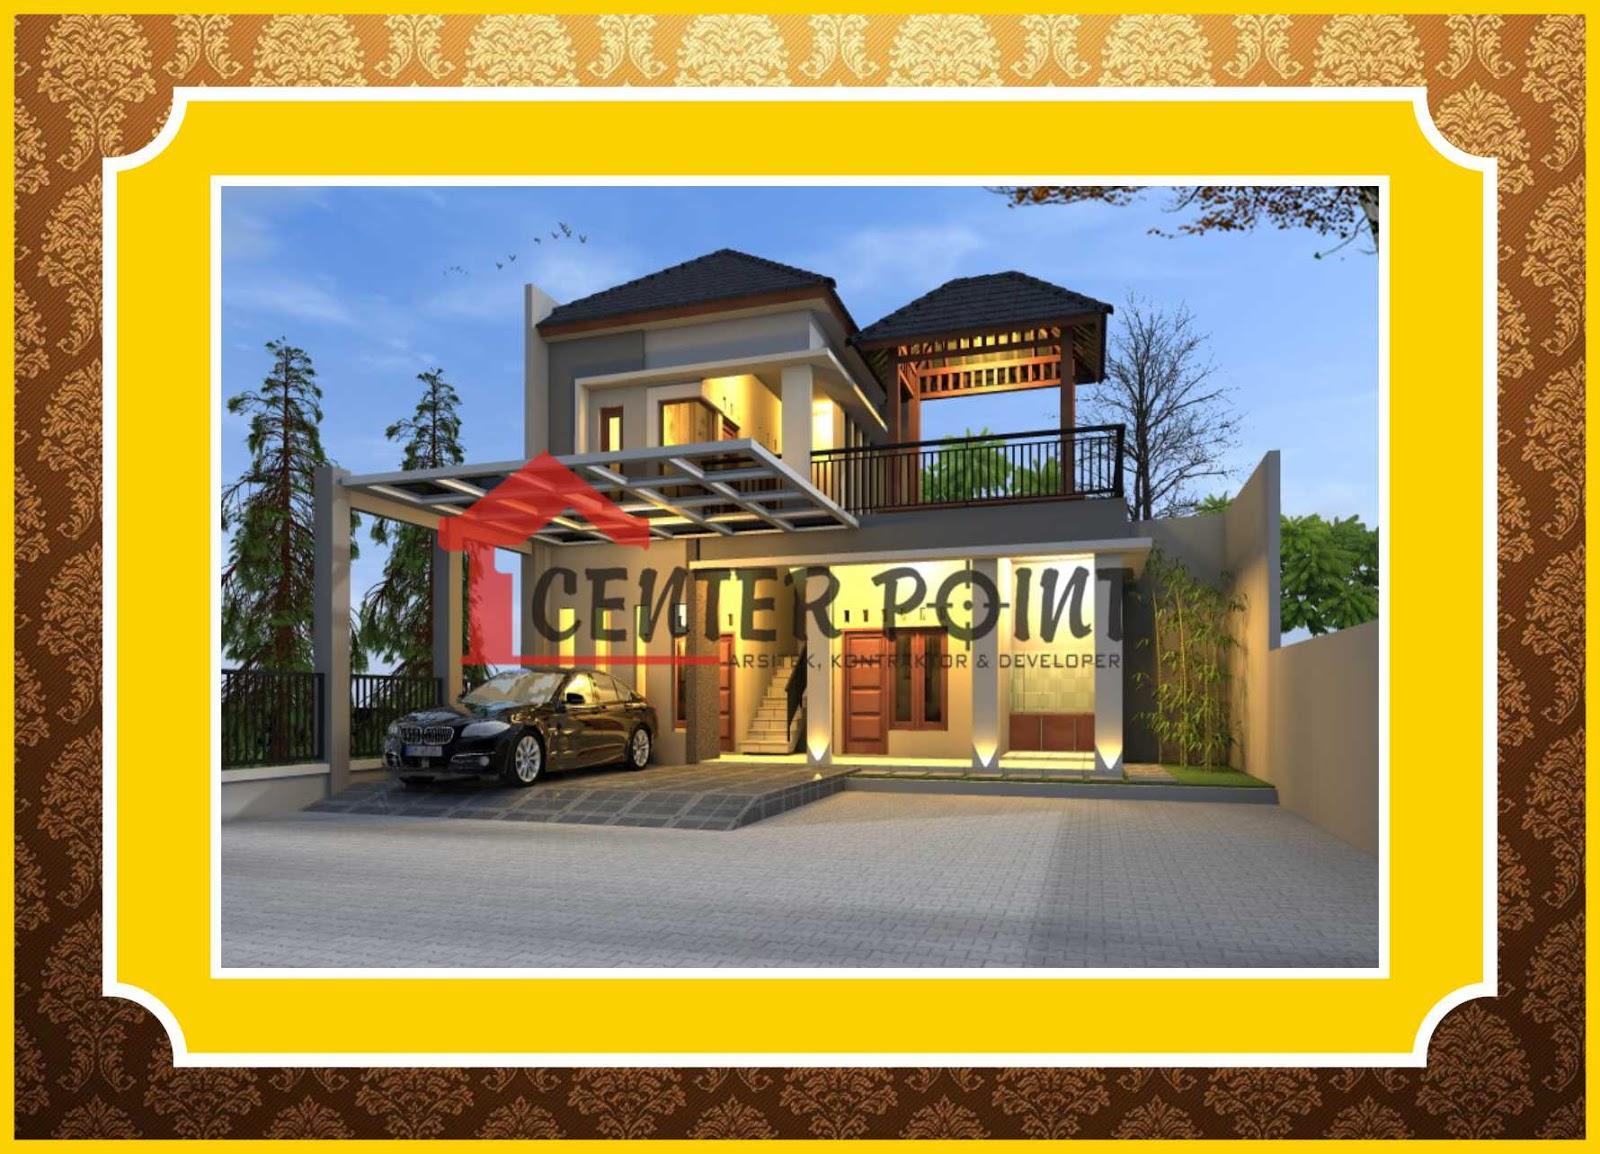 Jasa Gambar Rumah Probolinggo Minimalis Etnik Batu Alam Bata